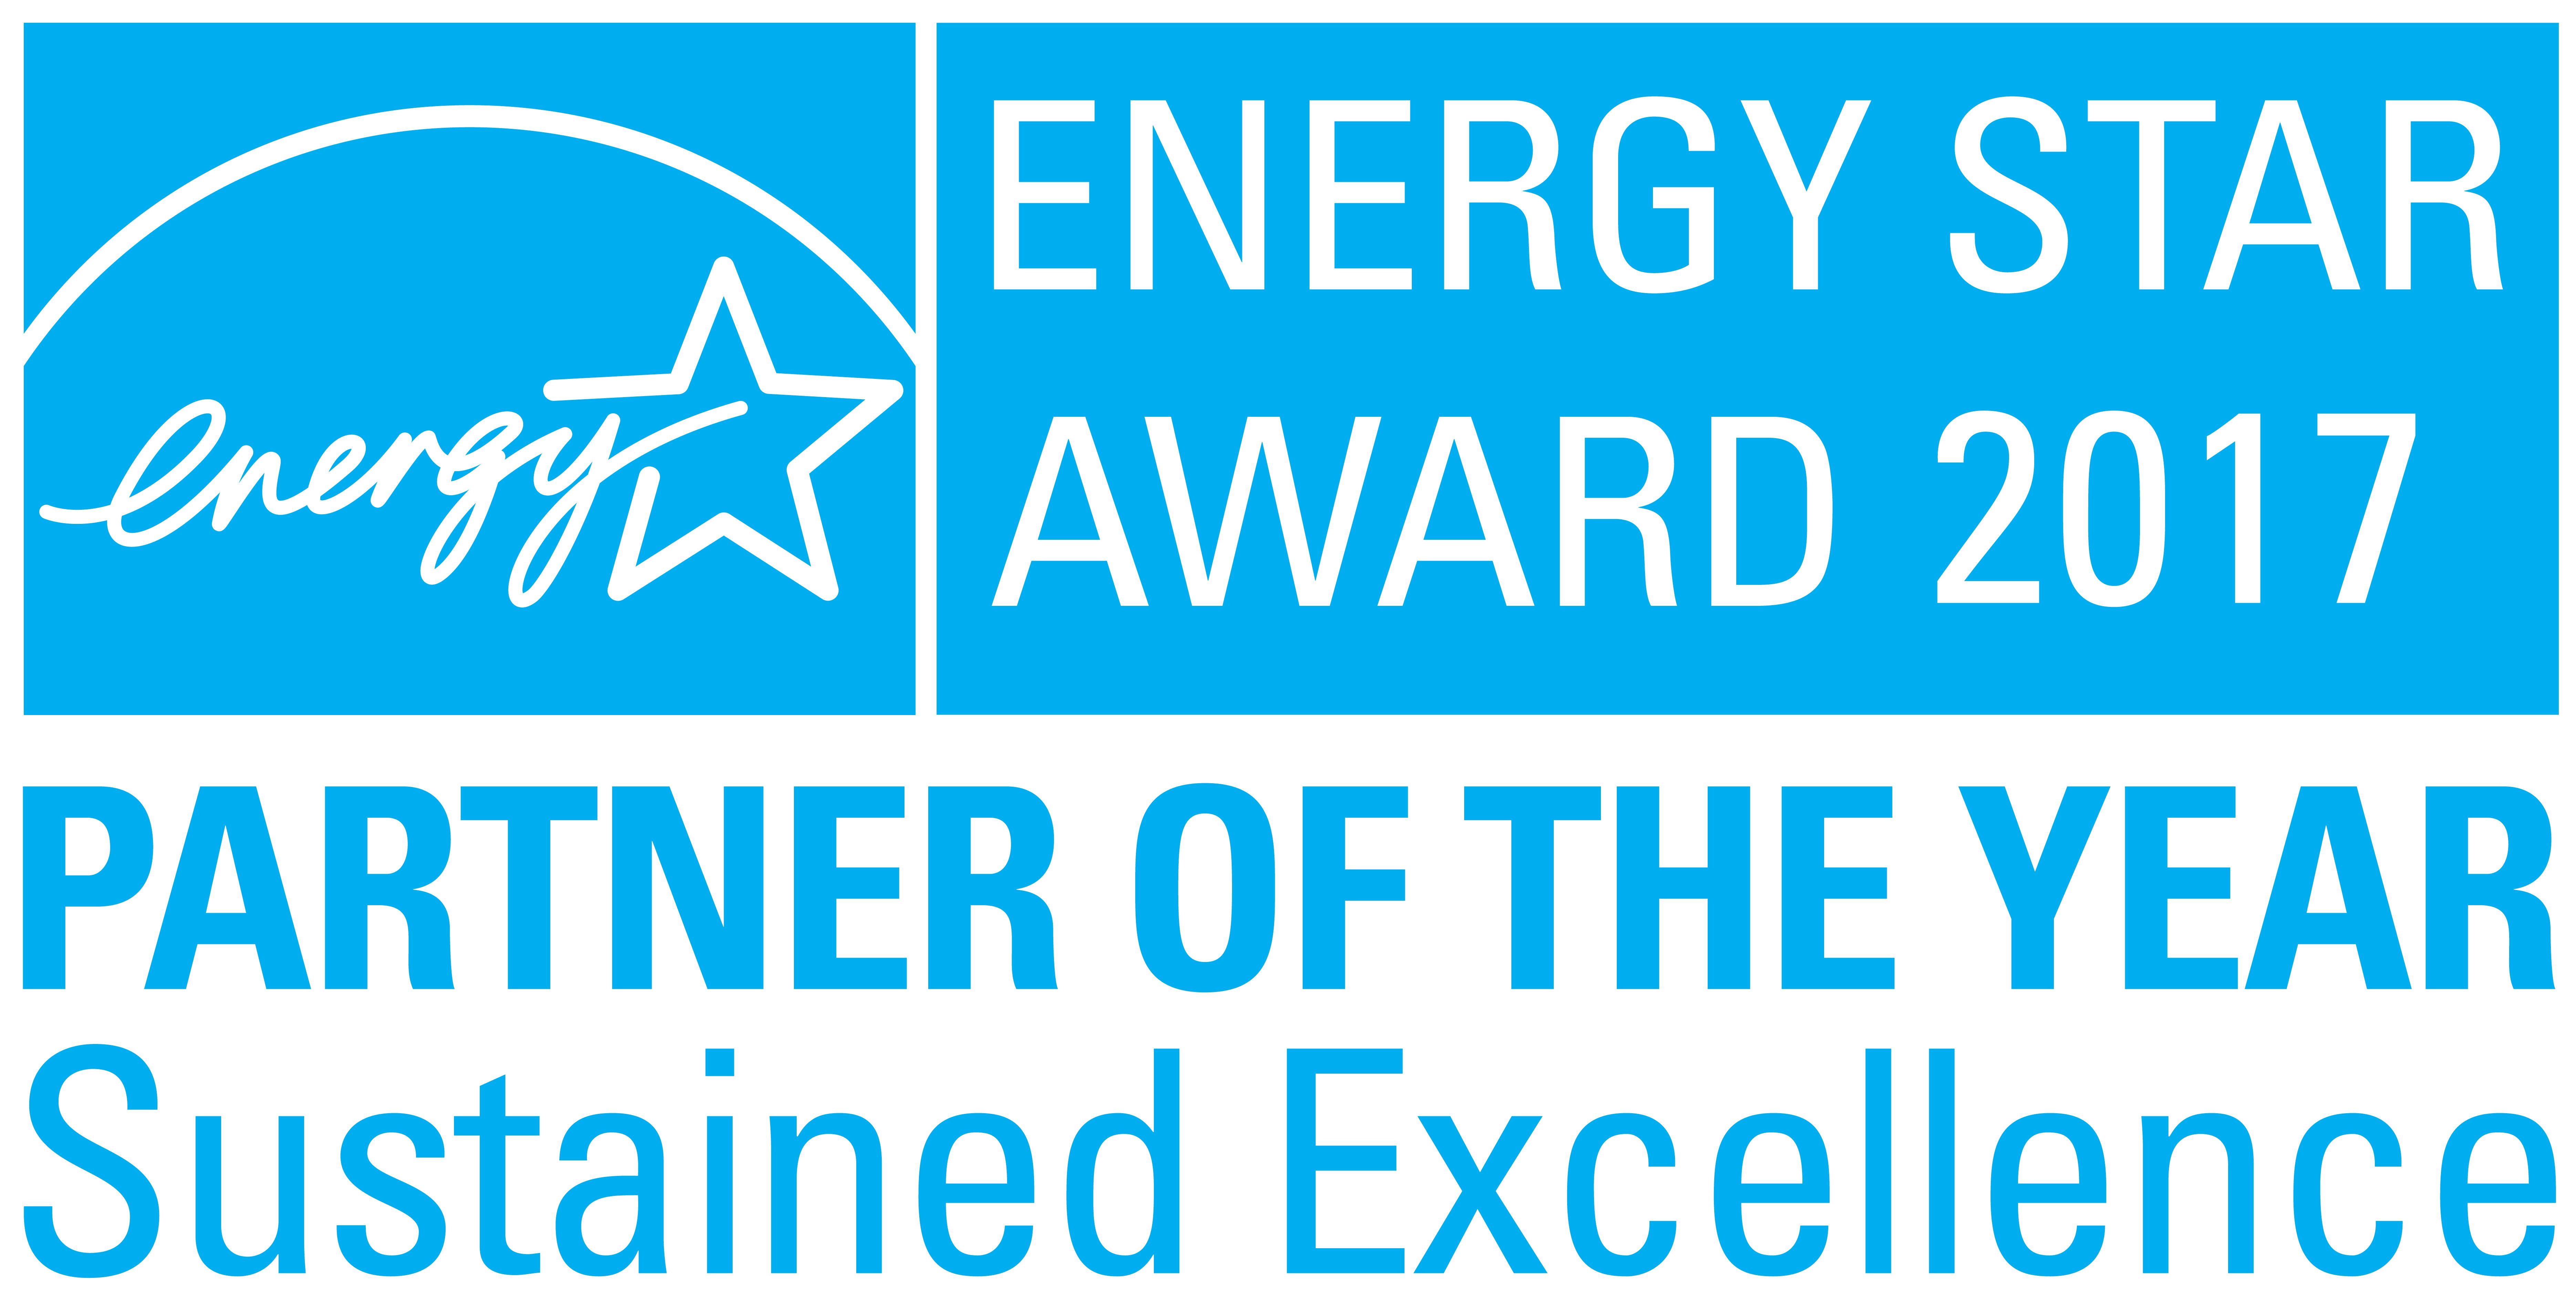 https://www.energystar.gov/about/content/eaton_0